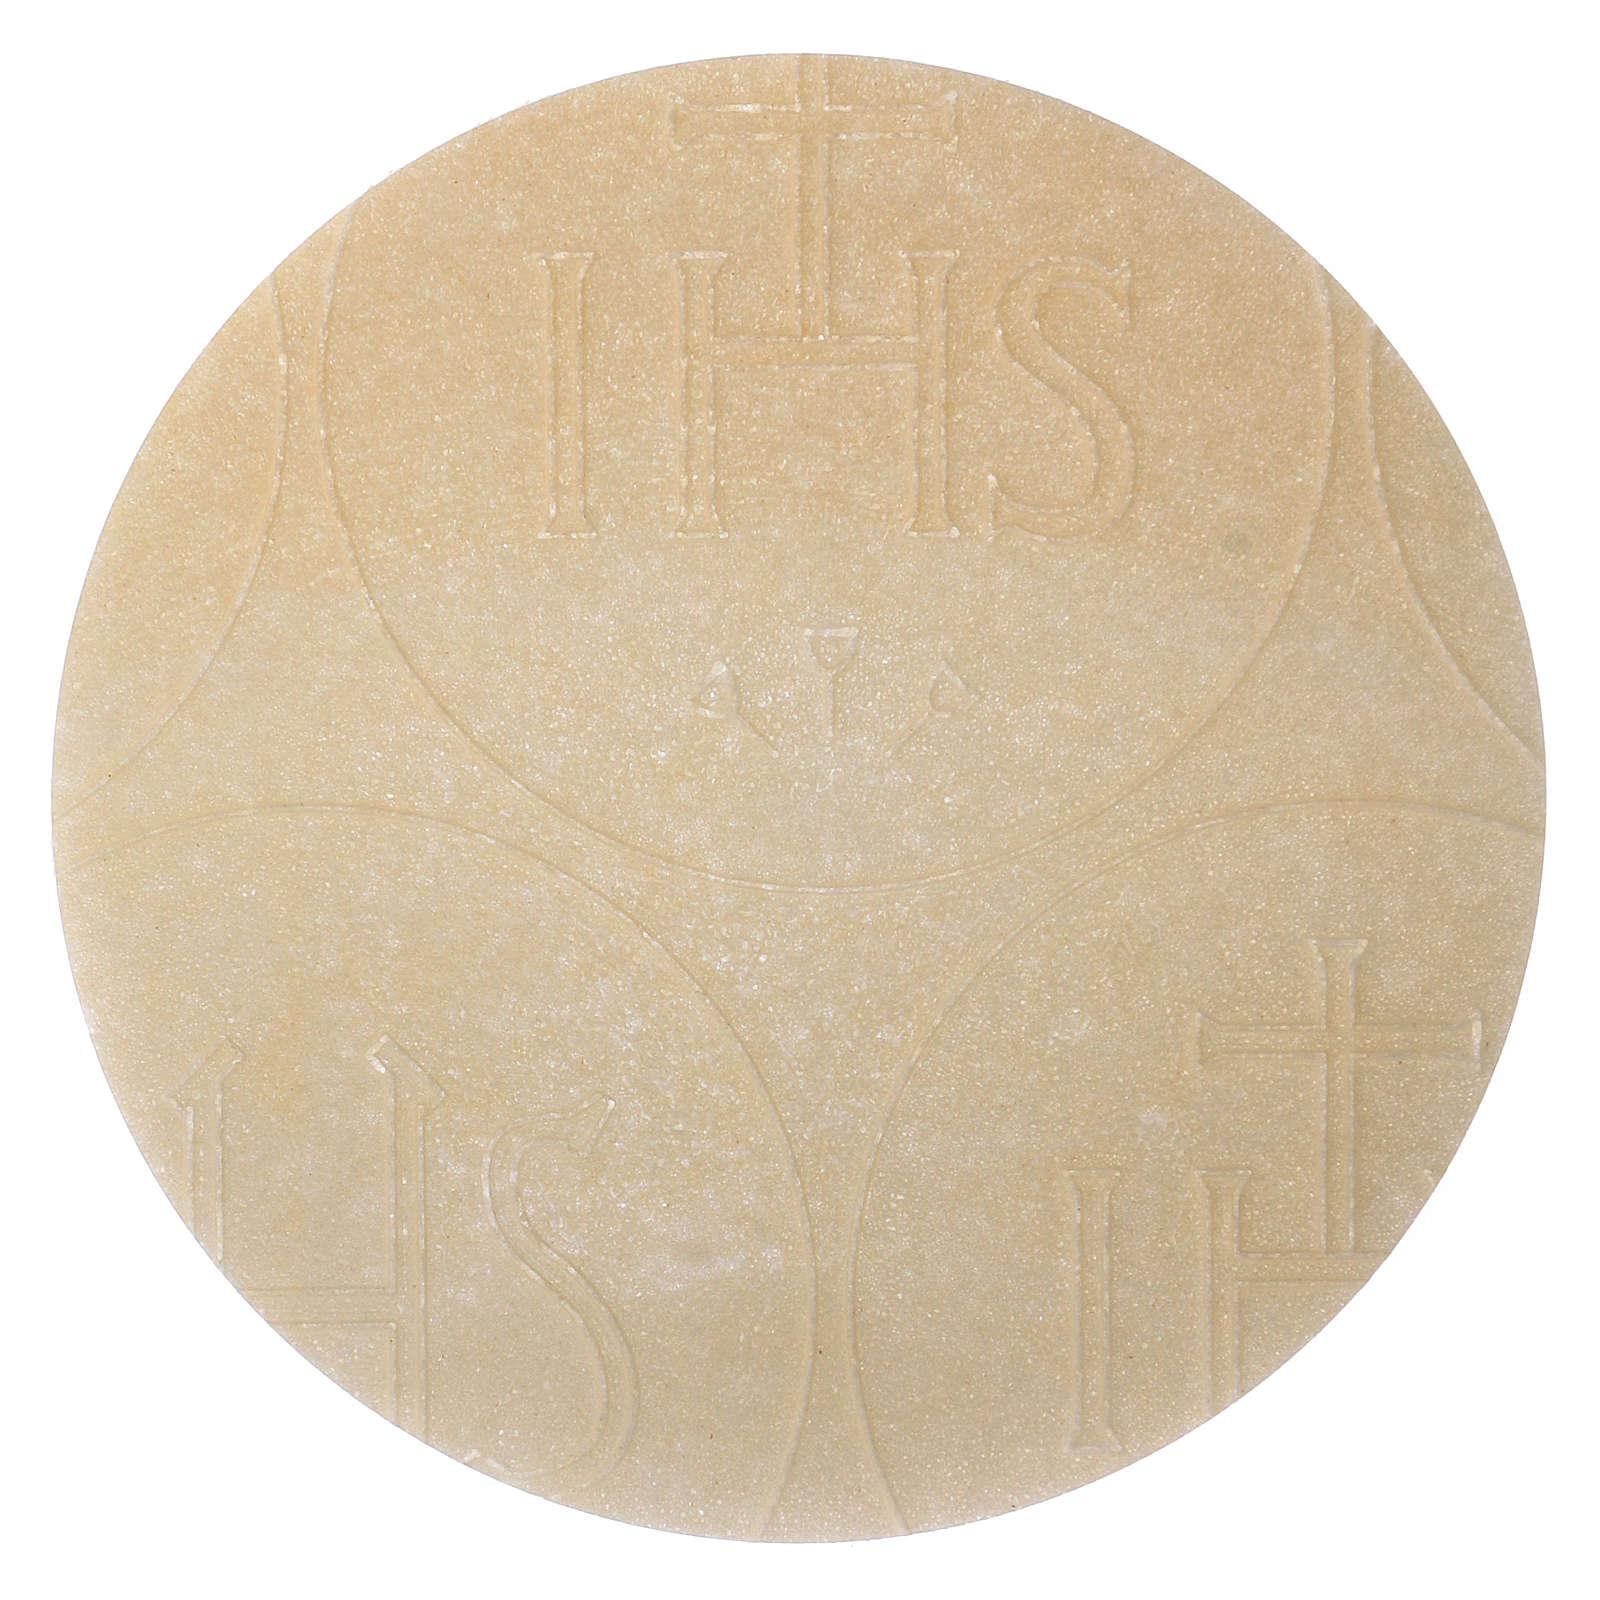 Ostia Concelebrazione 5 pz. diam. 12,5 cm sottile 3